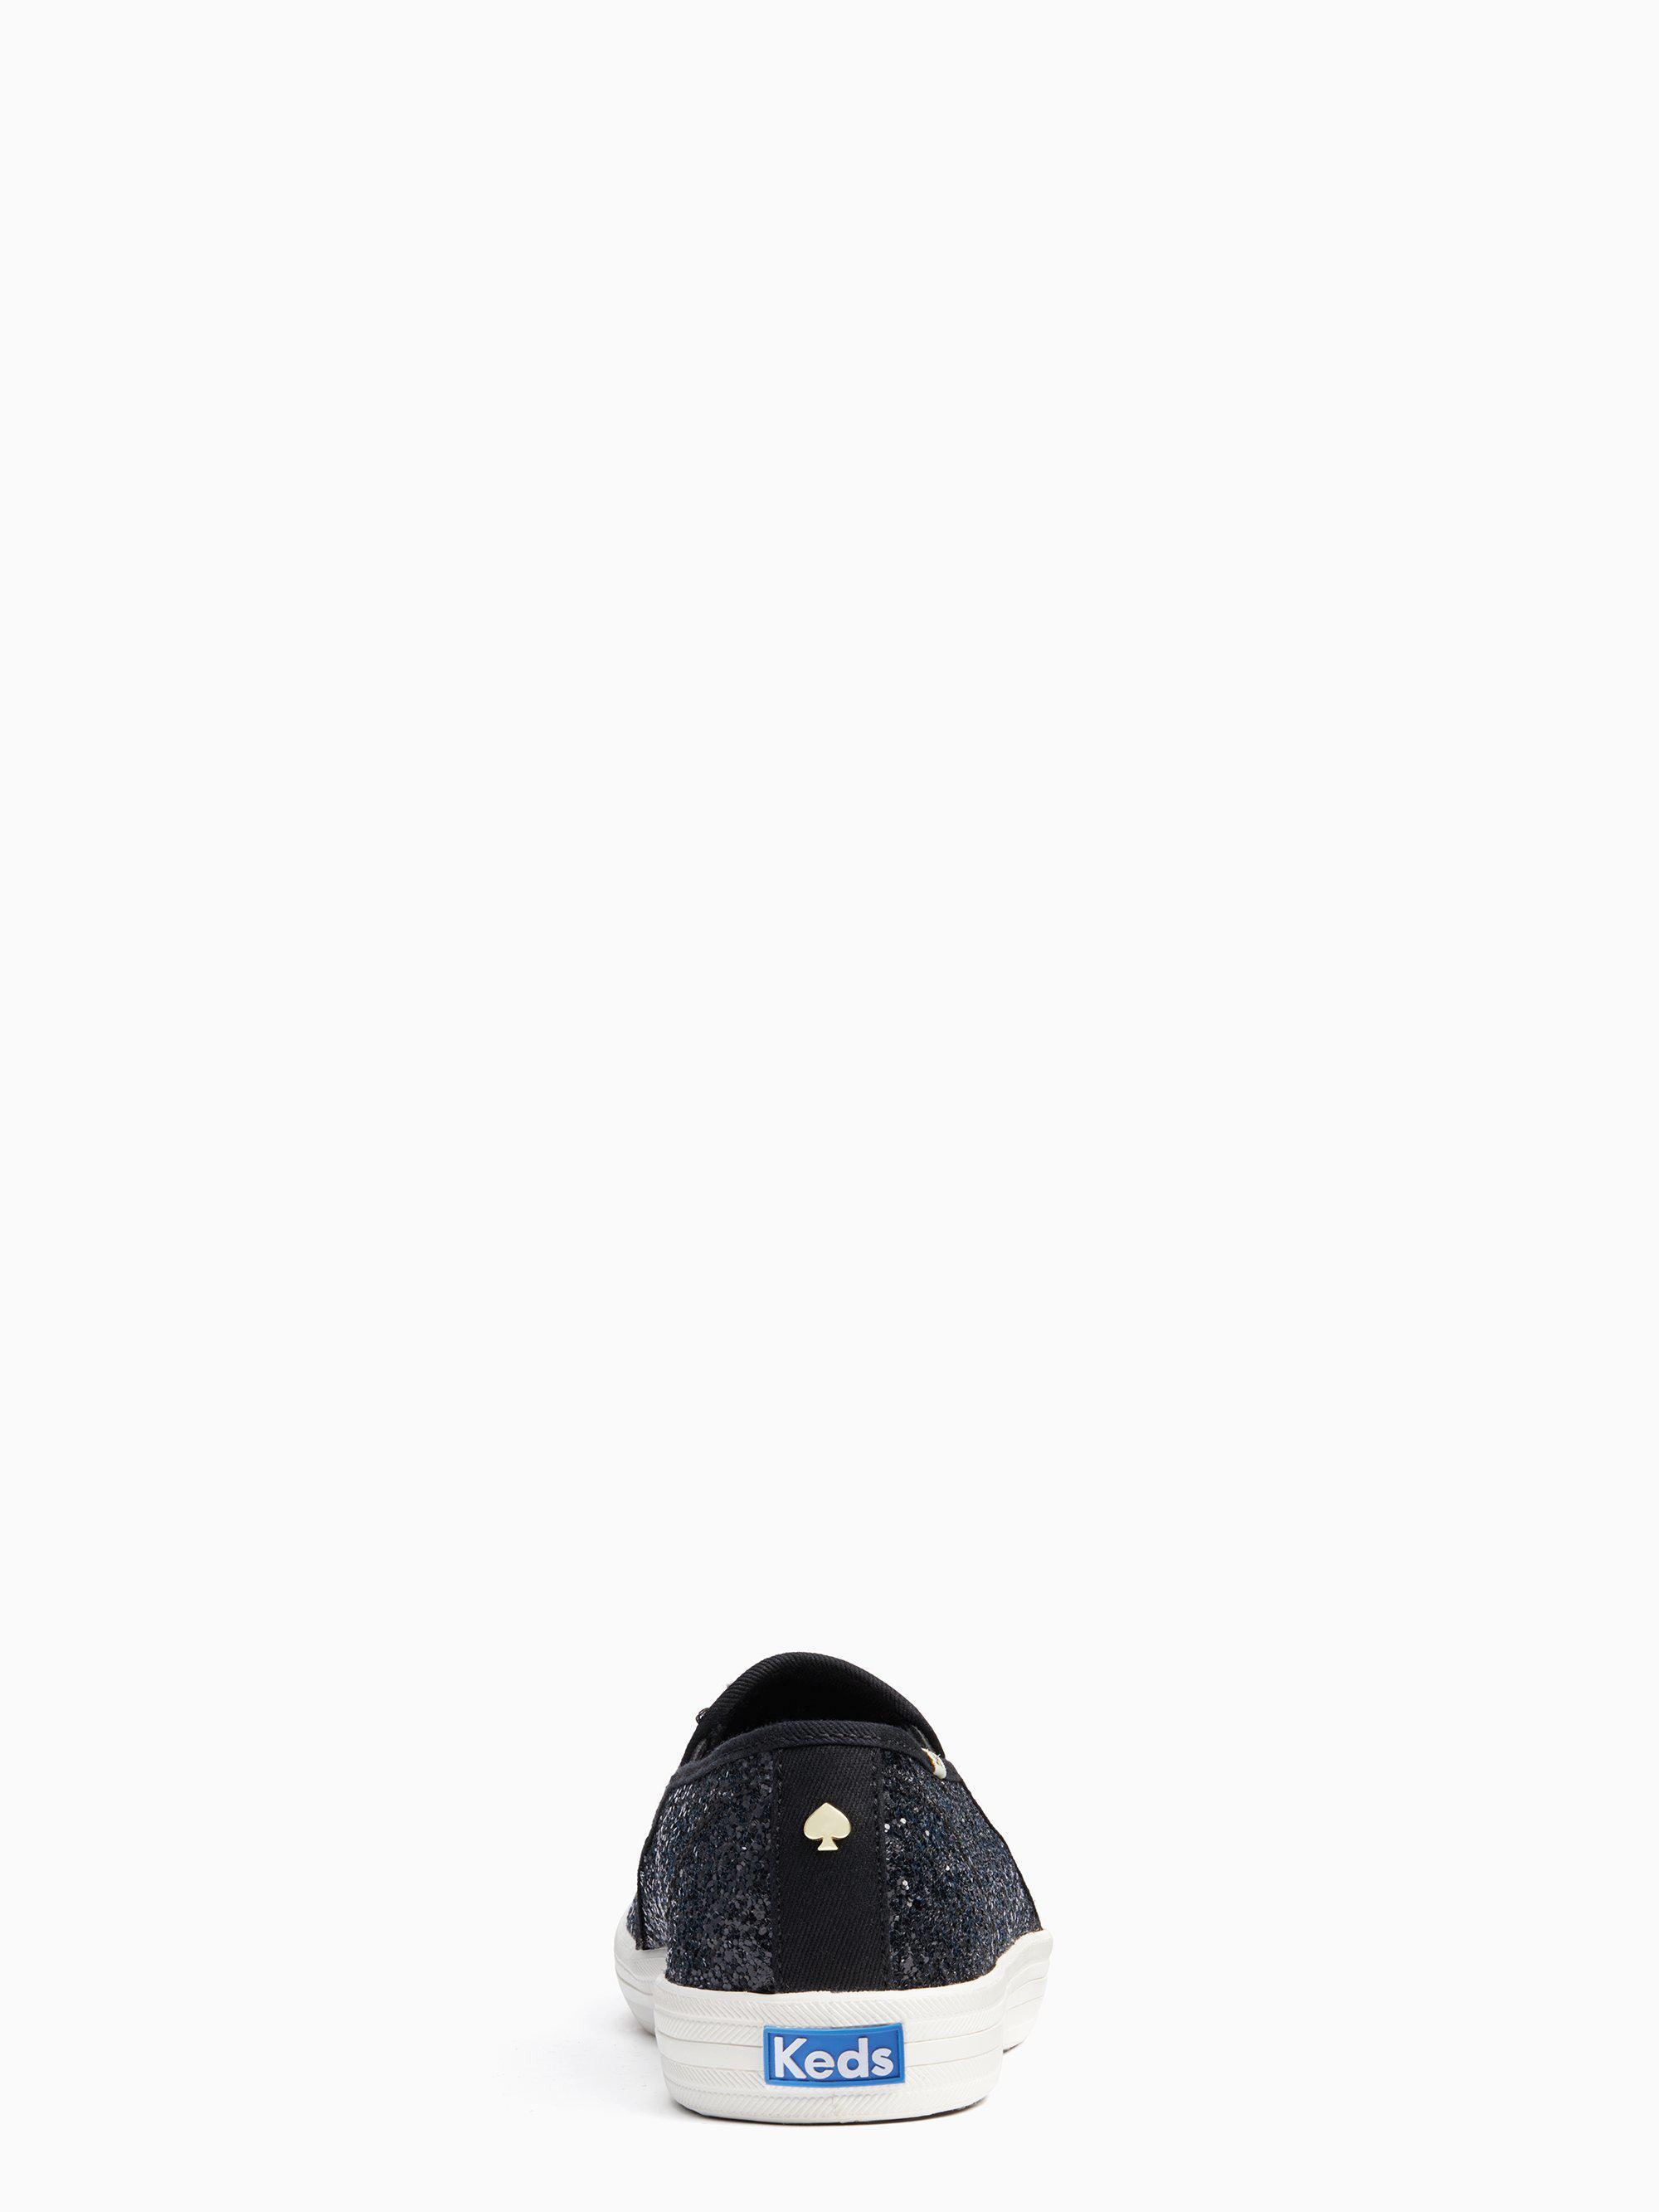 43f60e00827f Kate Spade - Black Keds X New York Double Decker Glitter Sneakers - Lyst.  View fullscreen